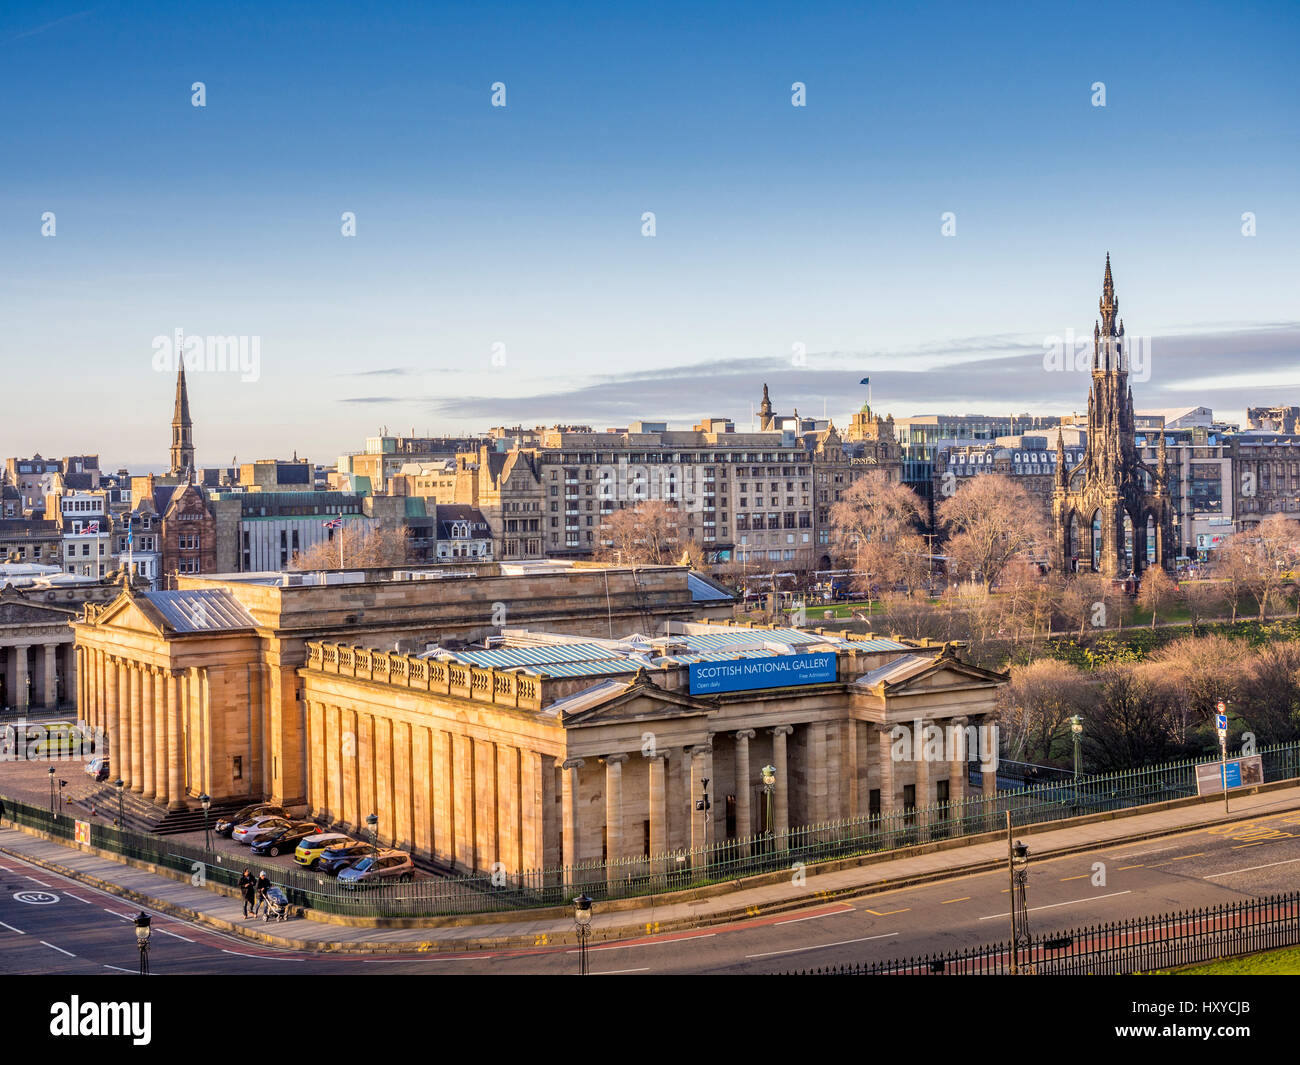 Scottish National Gallery, Edinburgh, Scotland, UK. Stock Photo